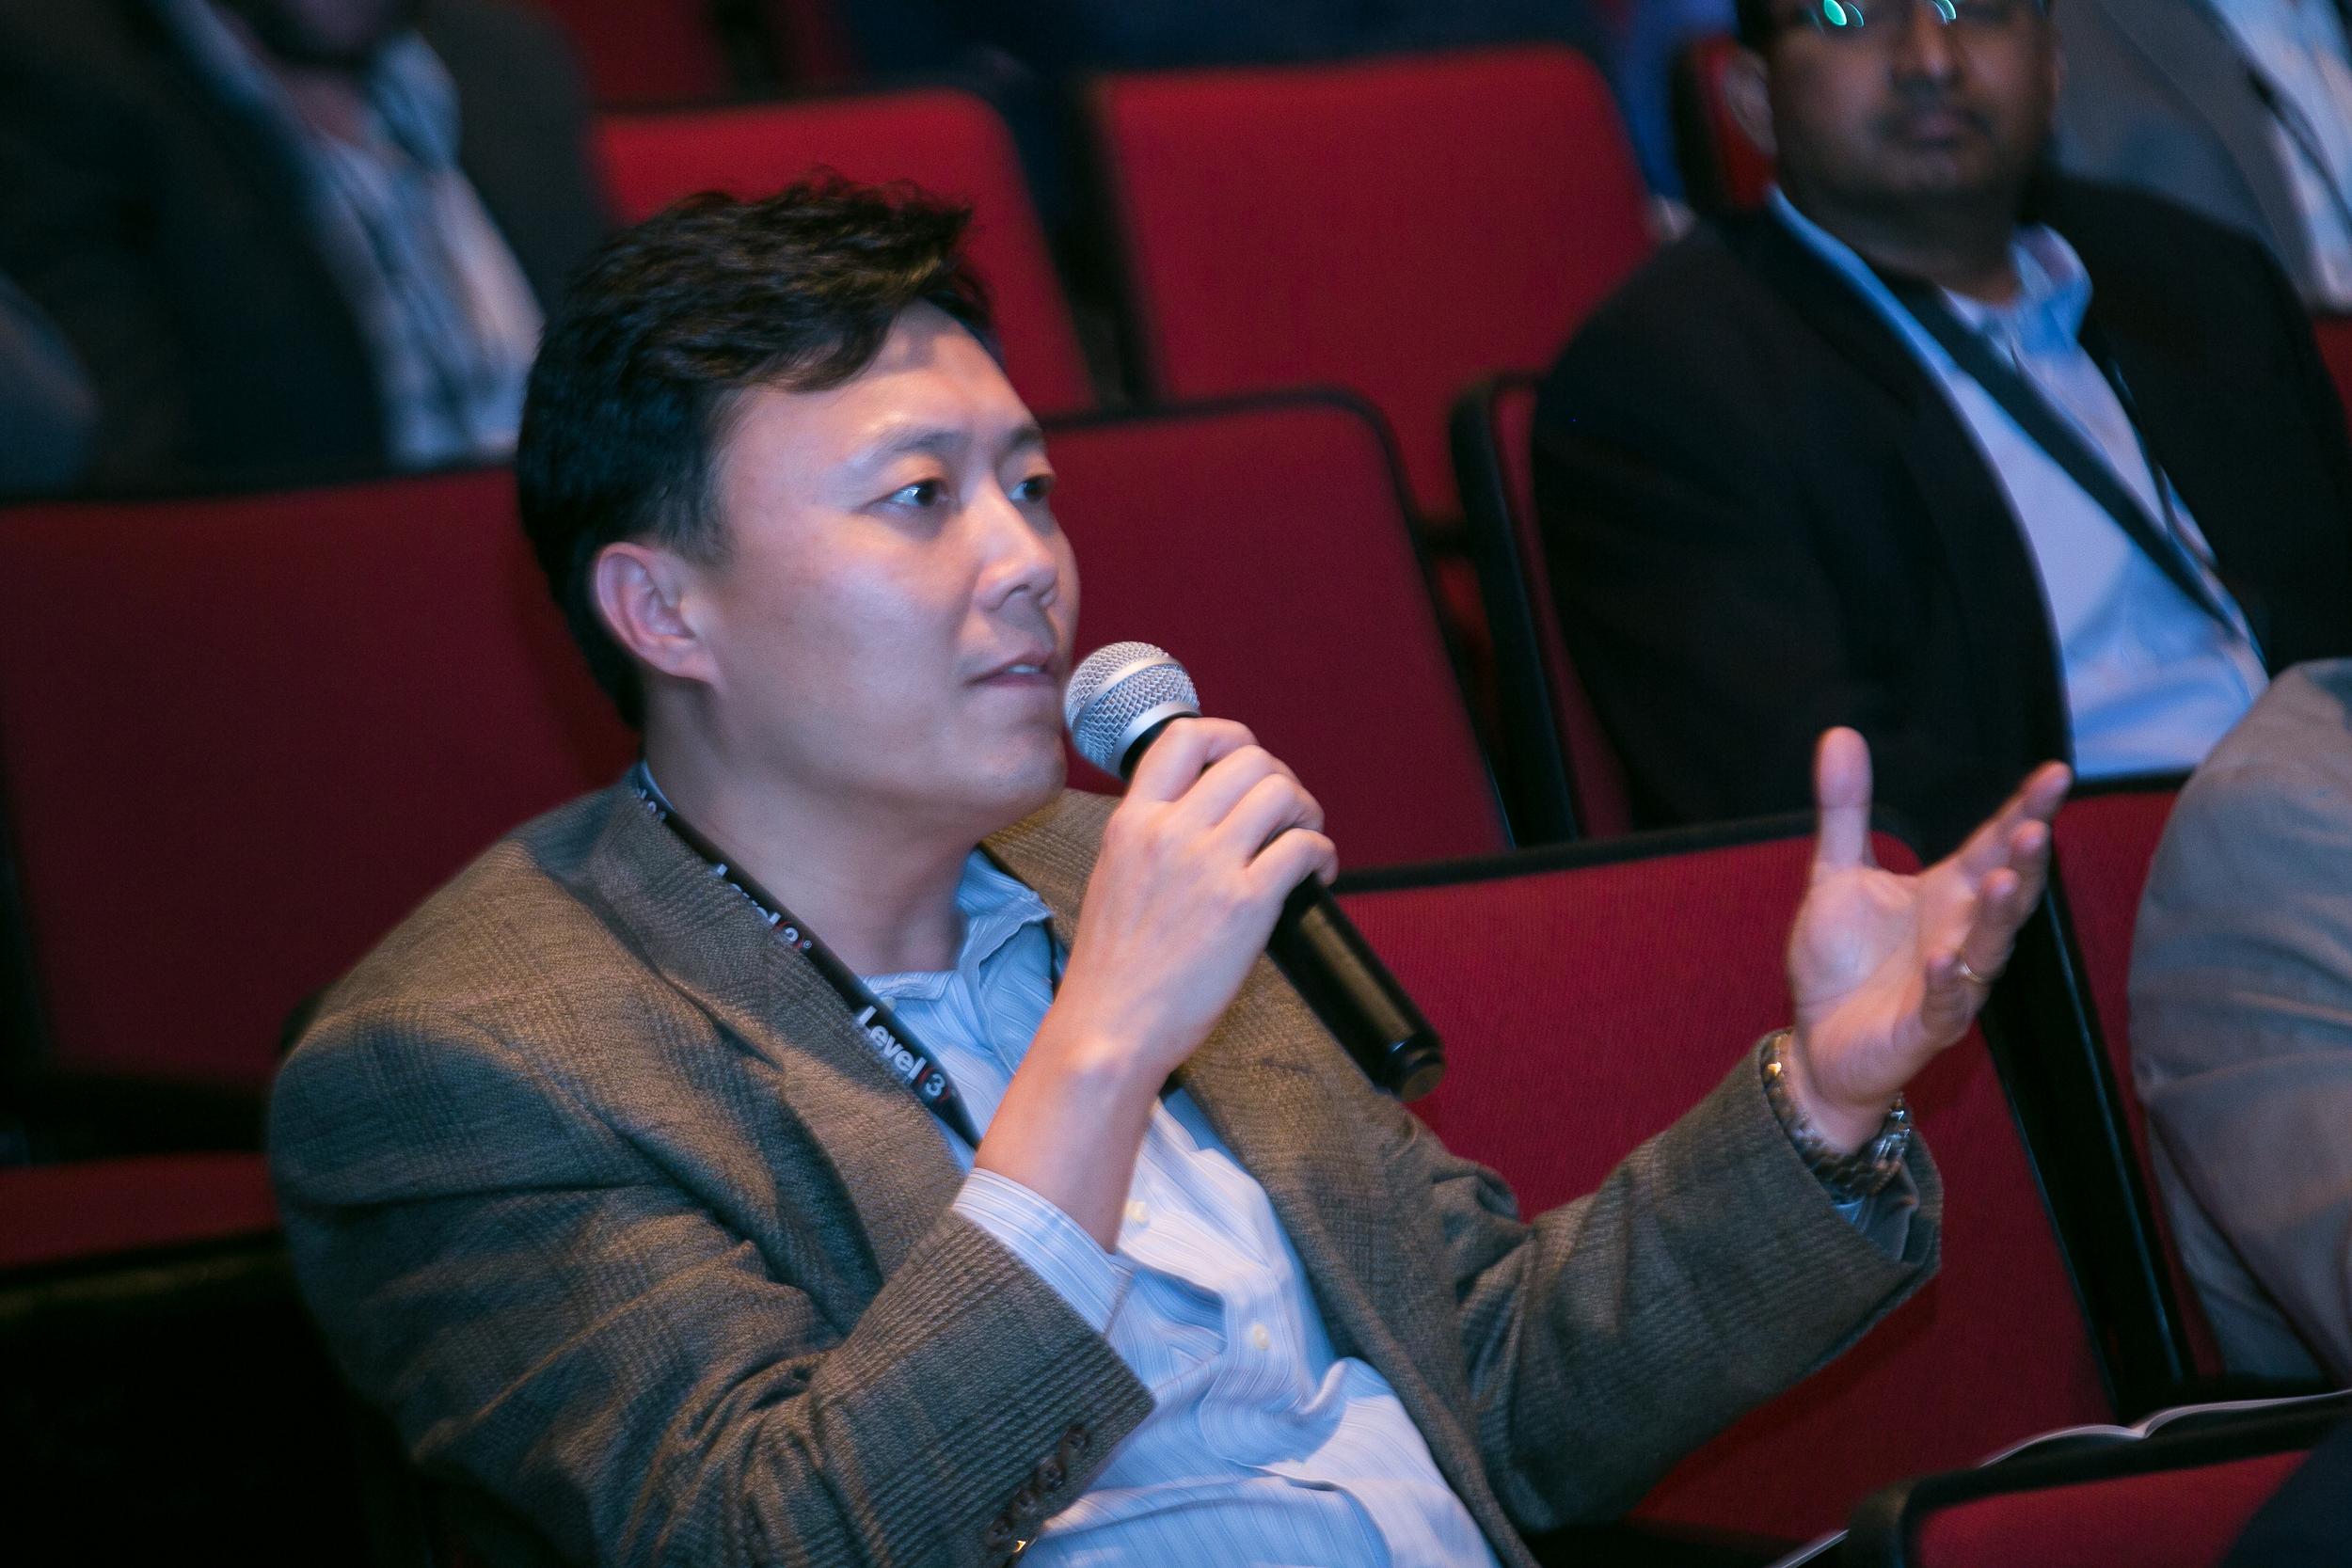 187-Capacity_Conferences-WAN_Summit-042715-6P9A0677.jpg